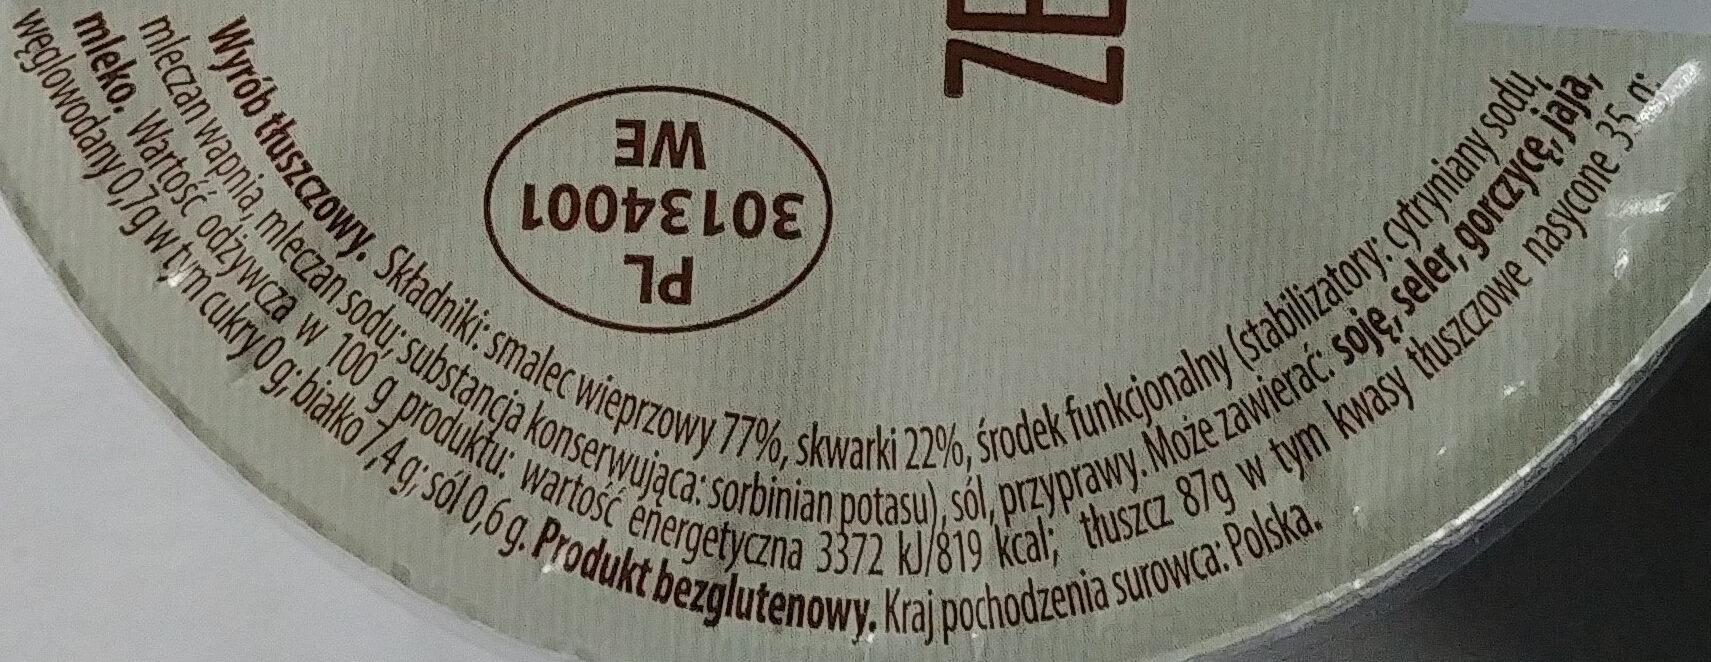 Smalec ze skwarkami - Nutrition facts - pl